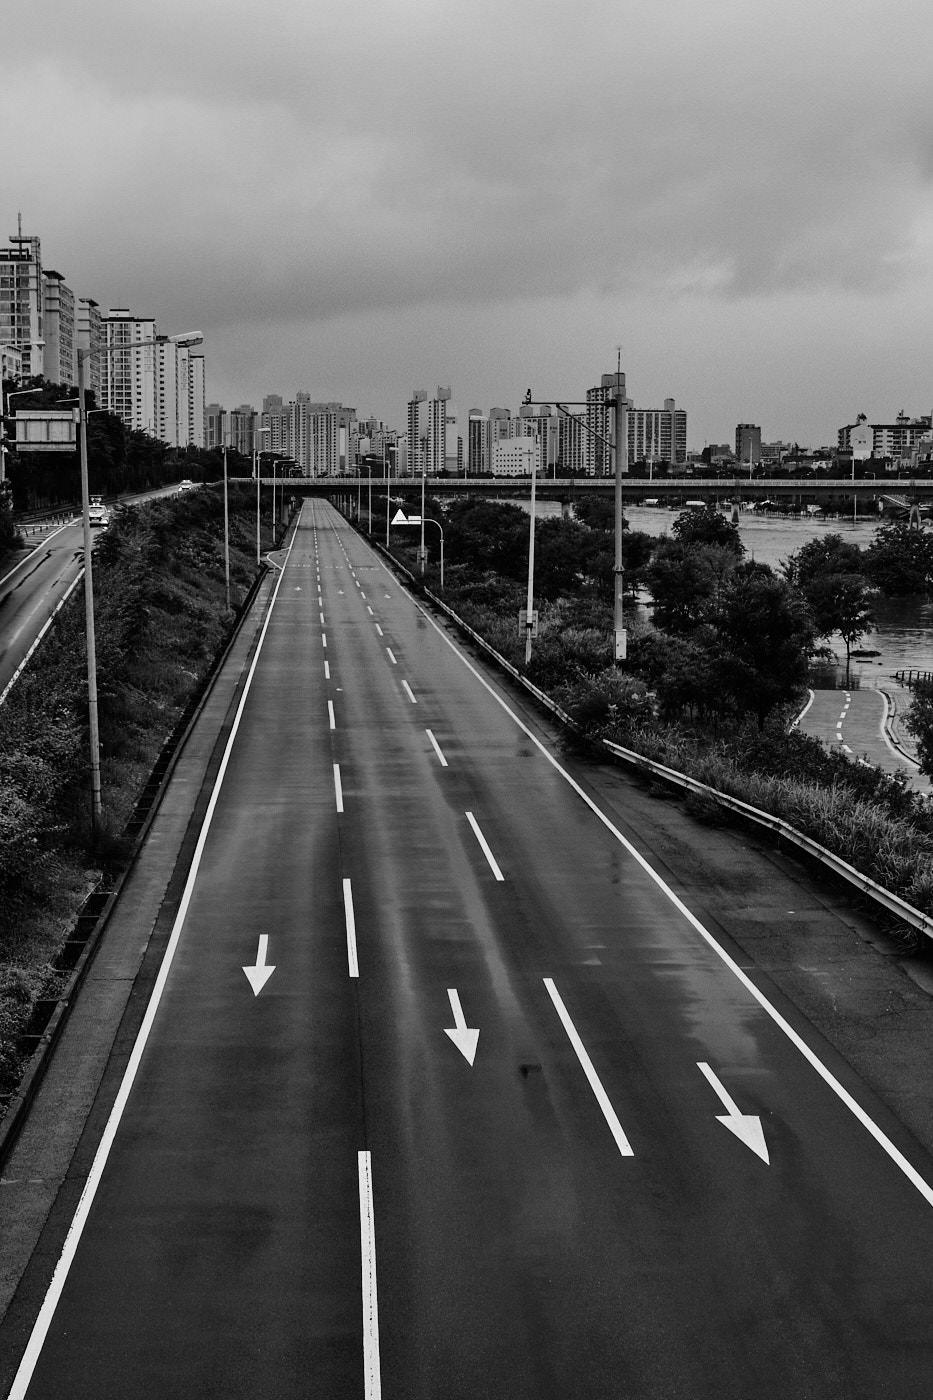 Closed Highway - Seoul Floods 2020